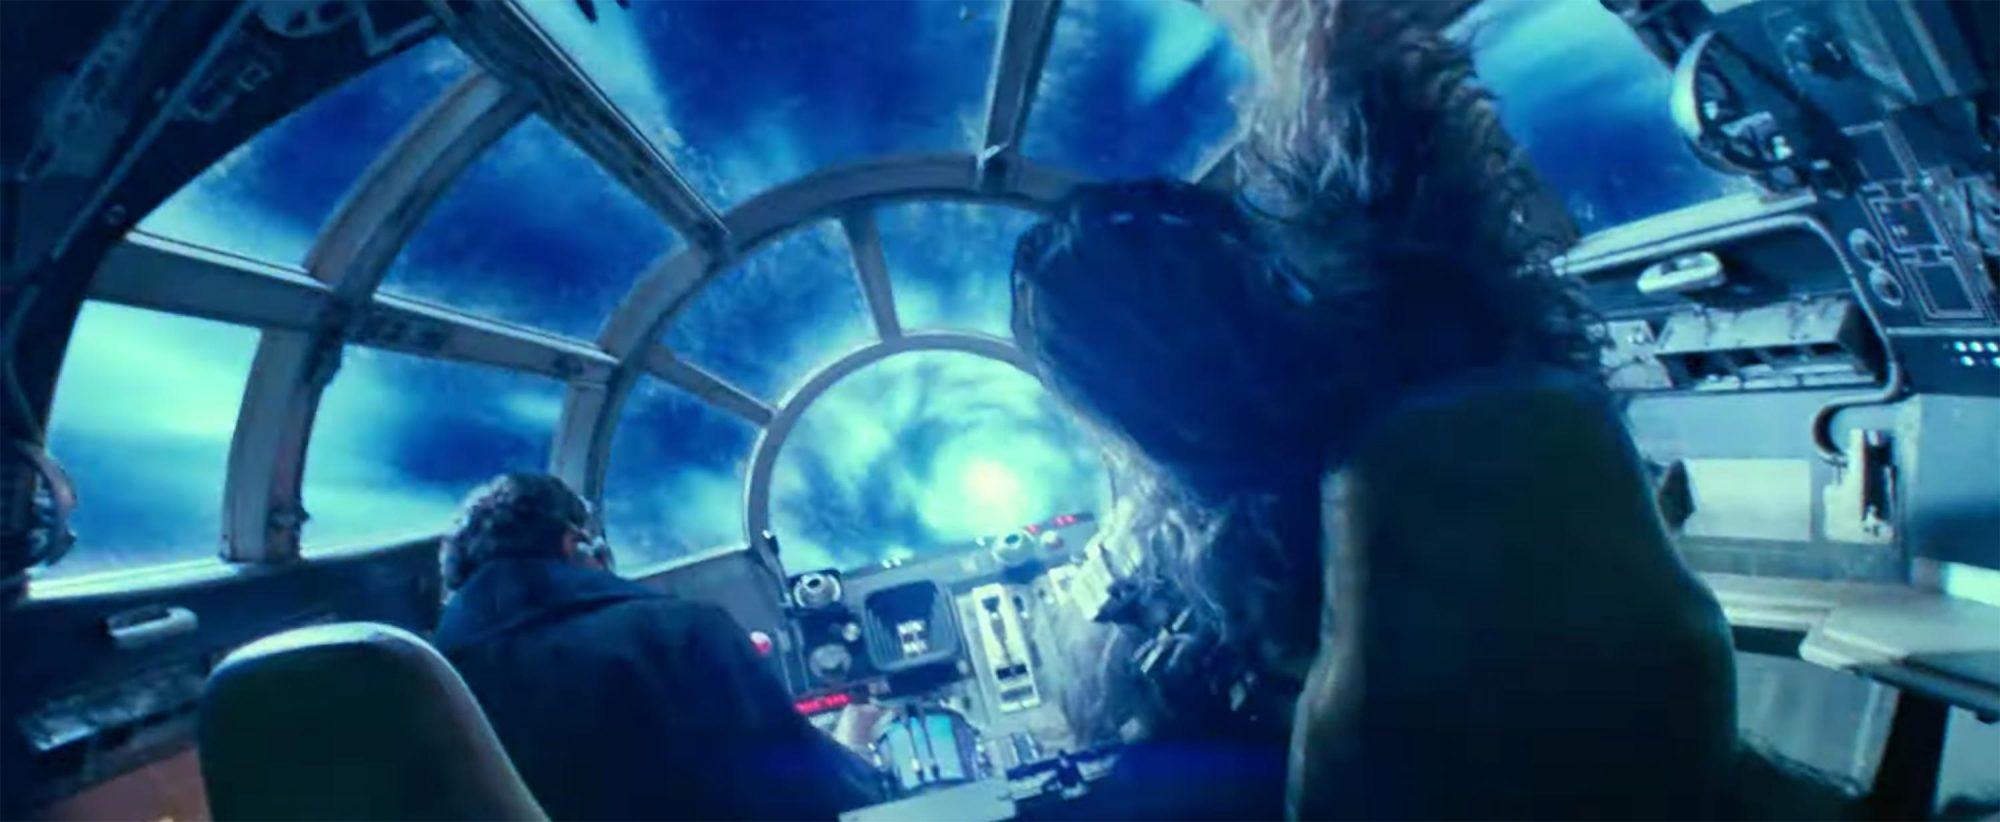 Star Wars Episode IX: The Rise of Skywalker screen grab